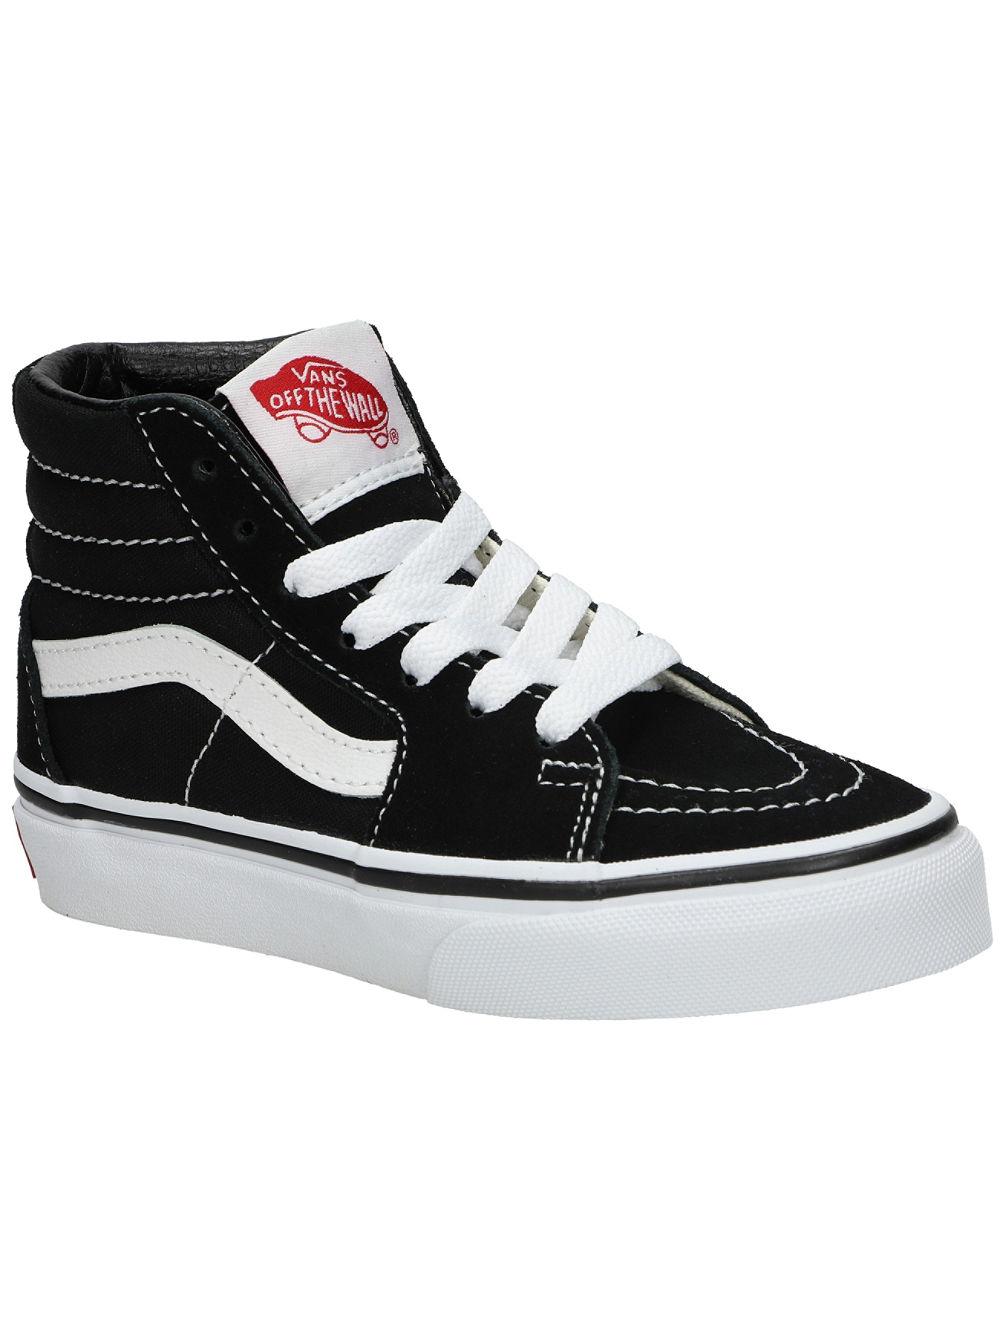 48bfbb9019 Vans Sk8-Hi Sneakers online kaufen bei Blue Tomato